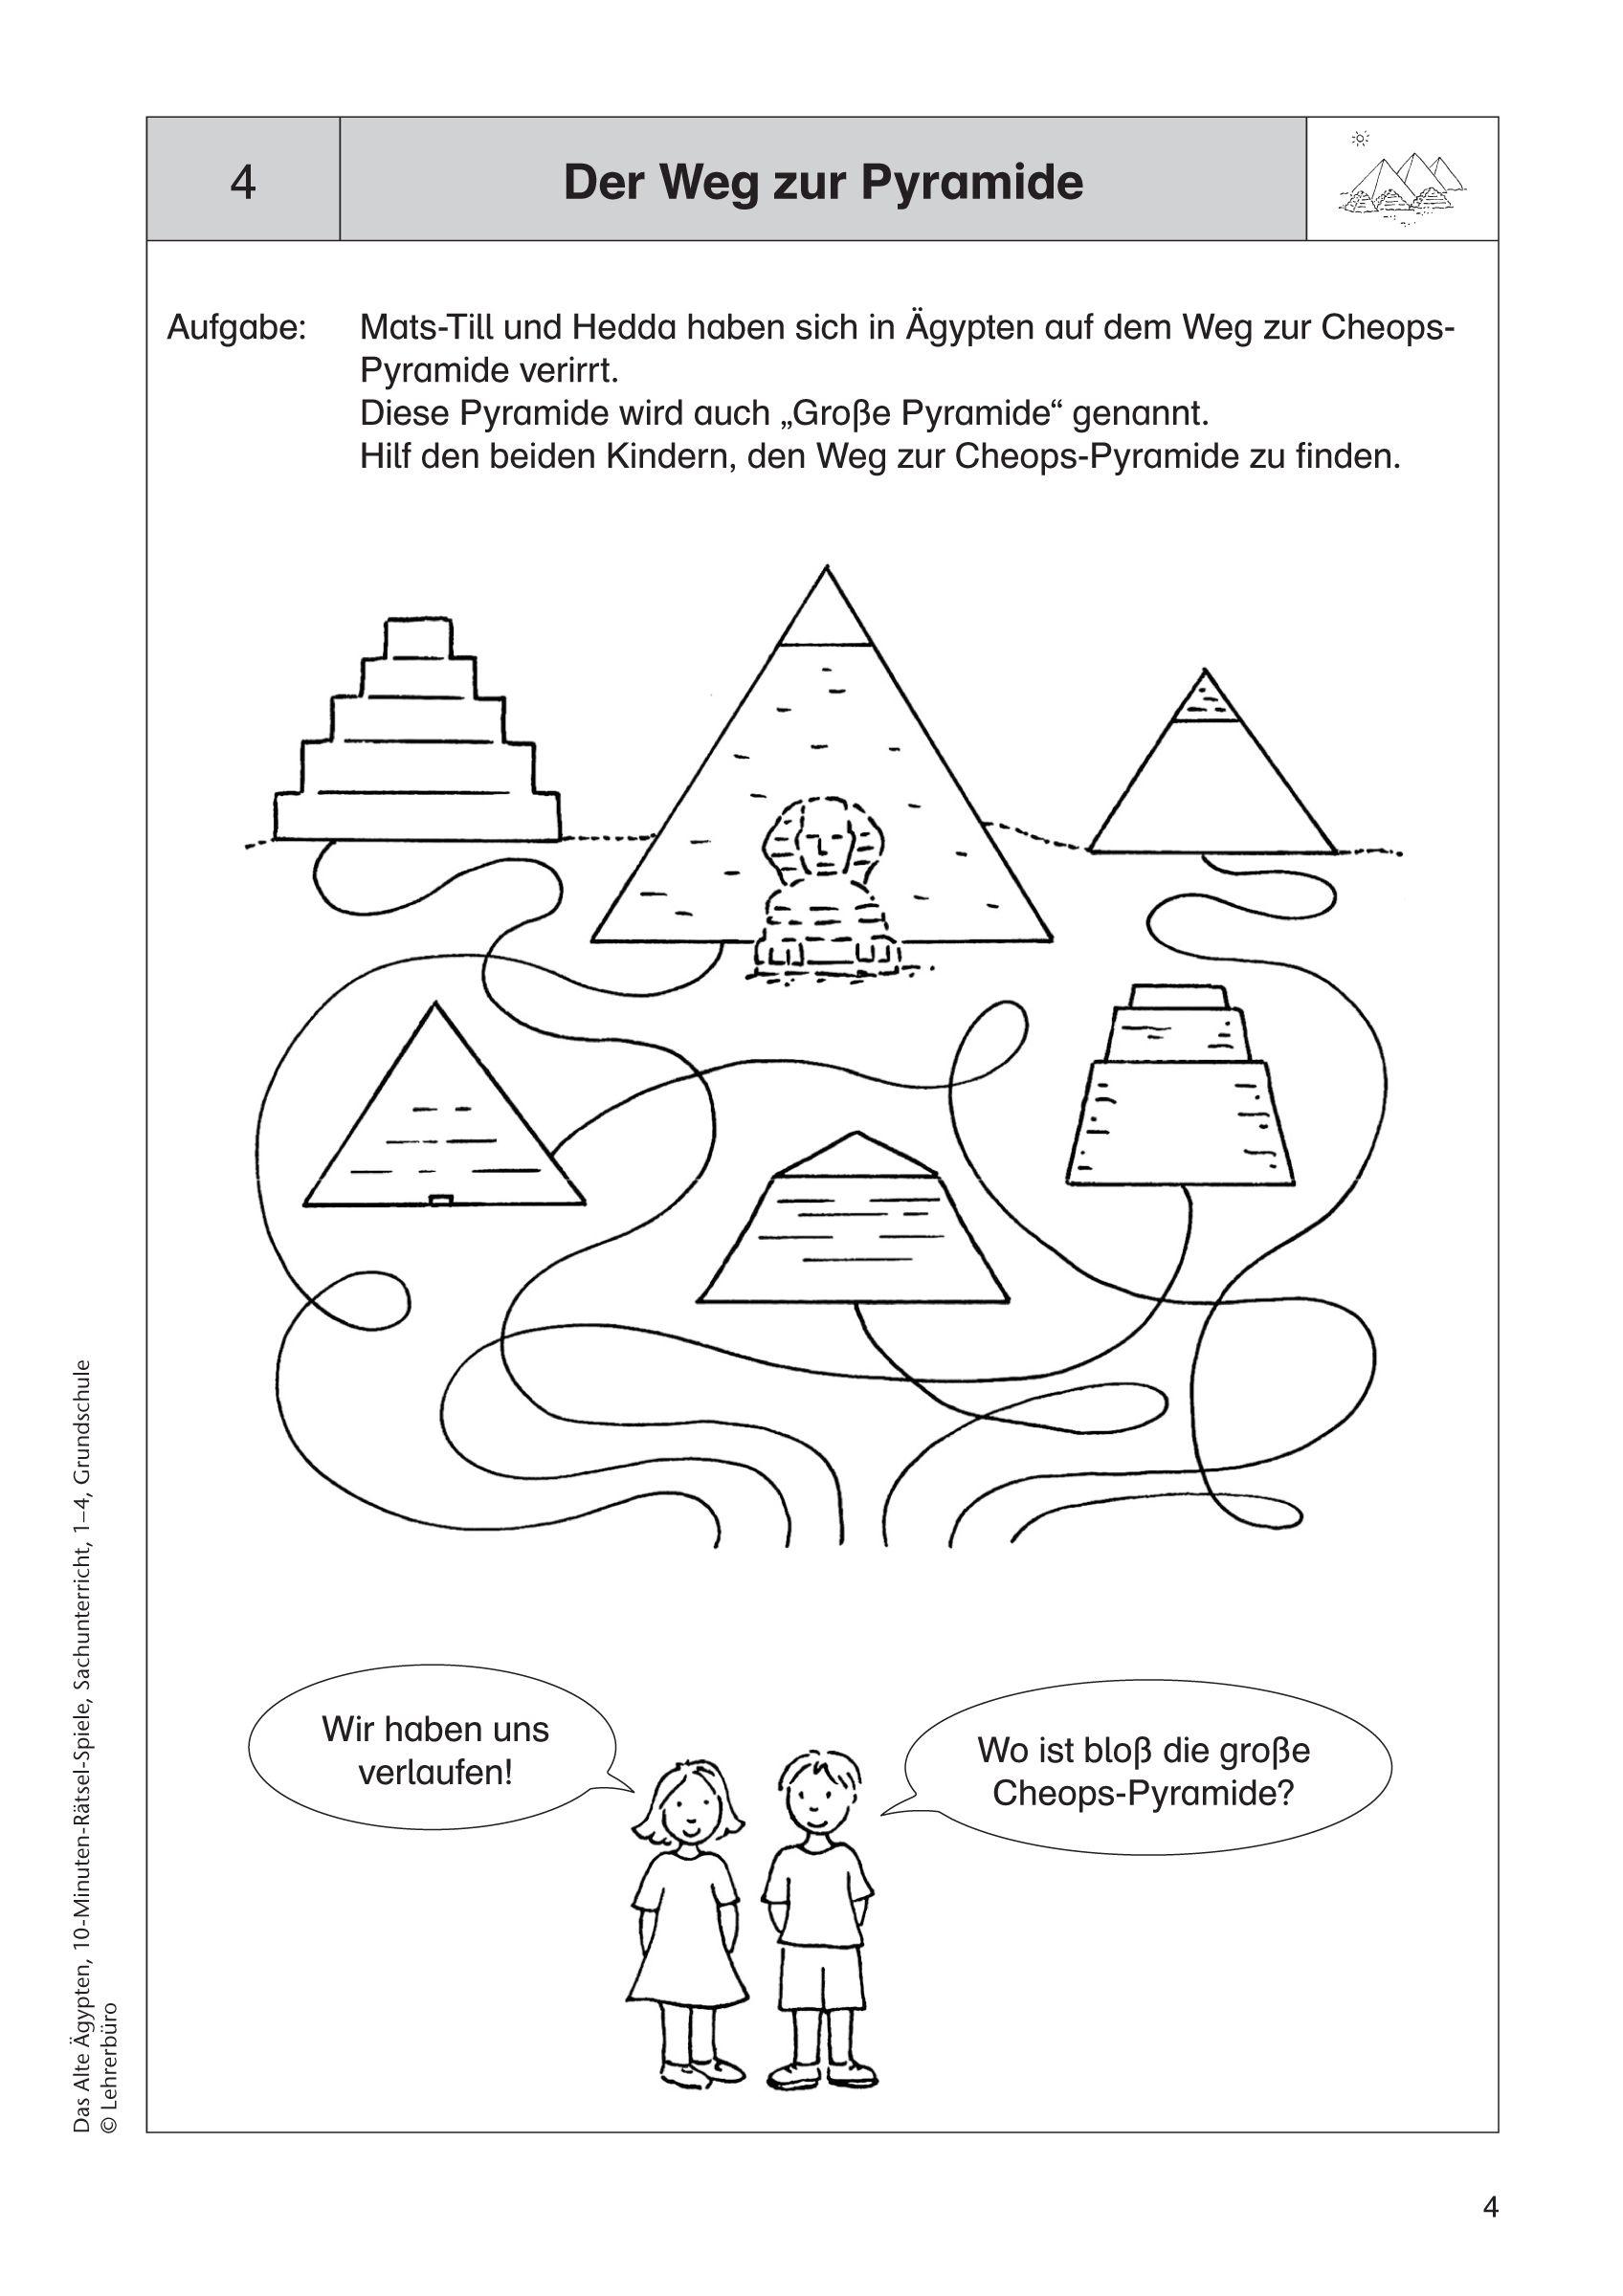 unterrichtsmaterialien grundschule lehrerb ro kiddie zeug unterrichtsmaterial gypten. Black Bedroom Furniture Sets. Home Design Ideas